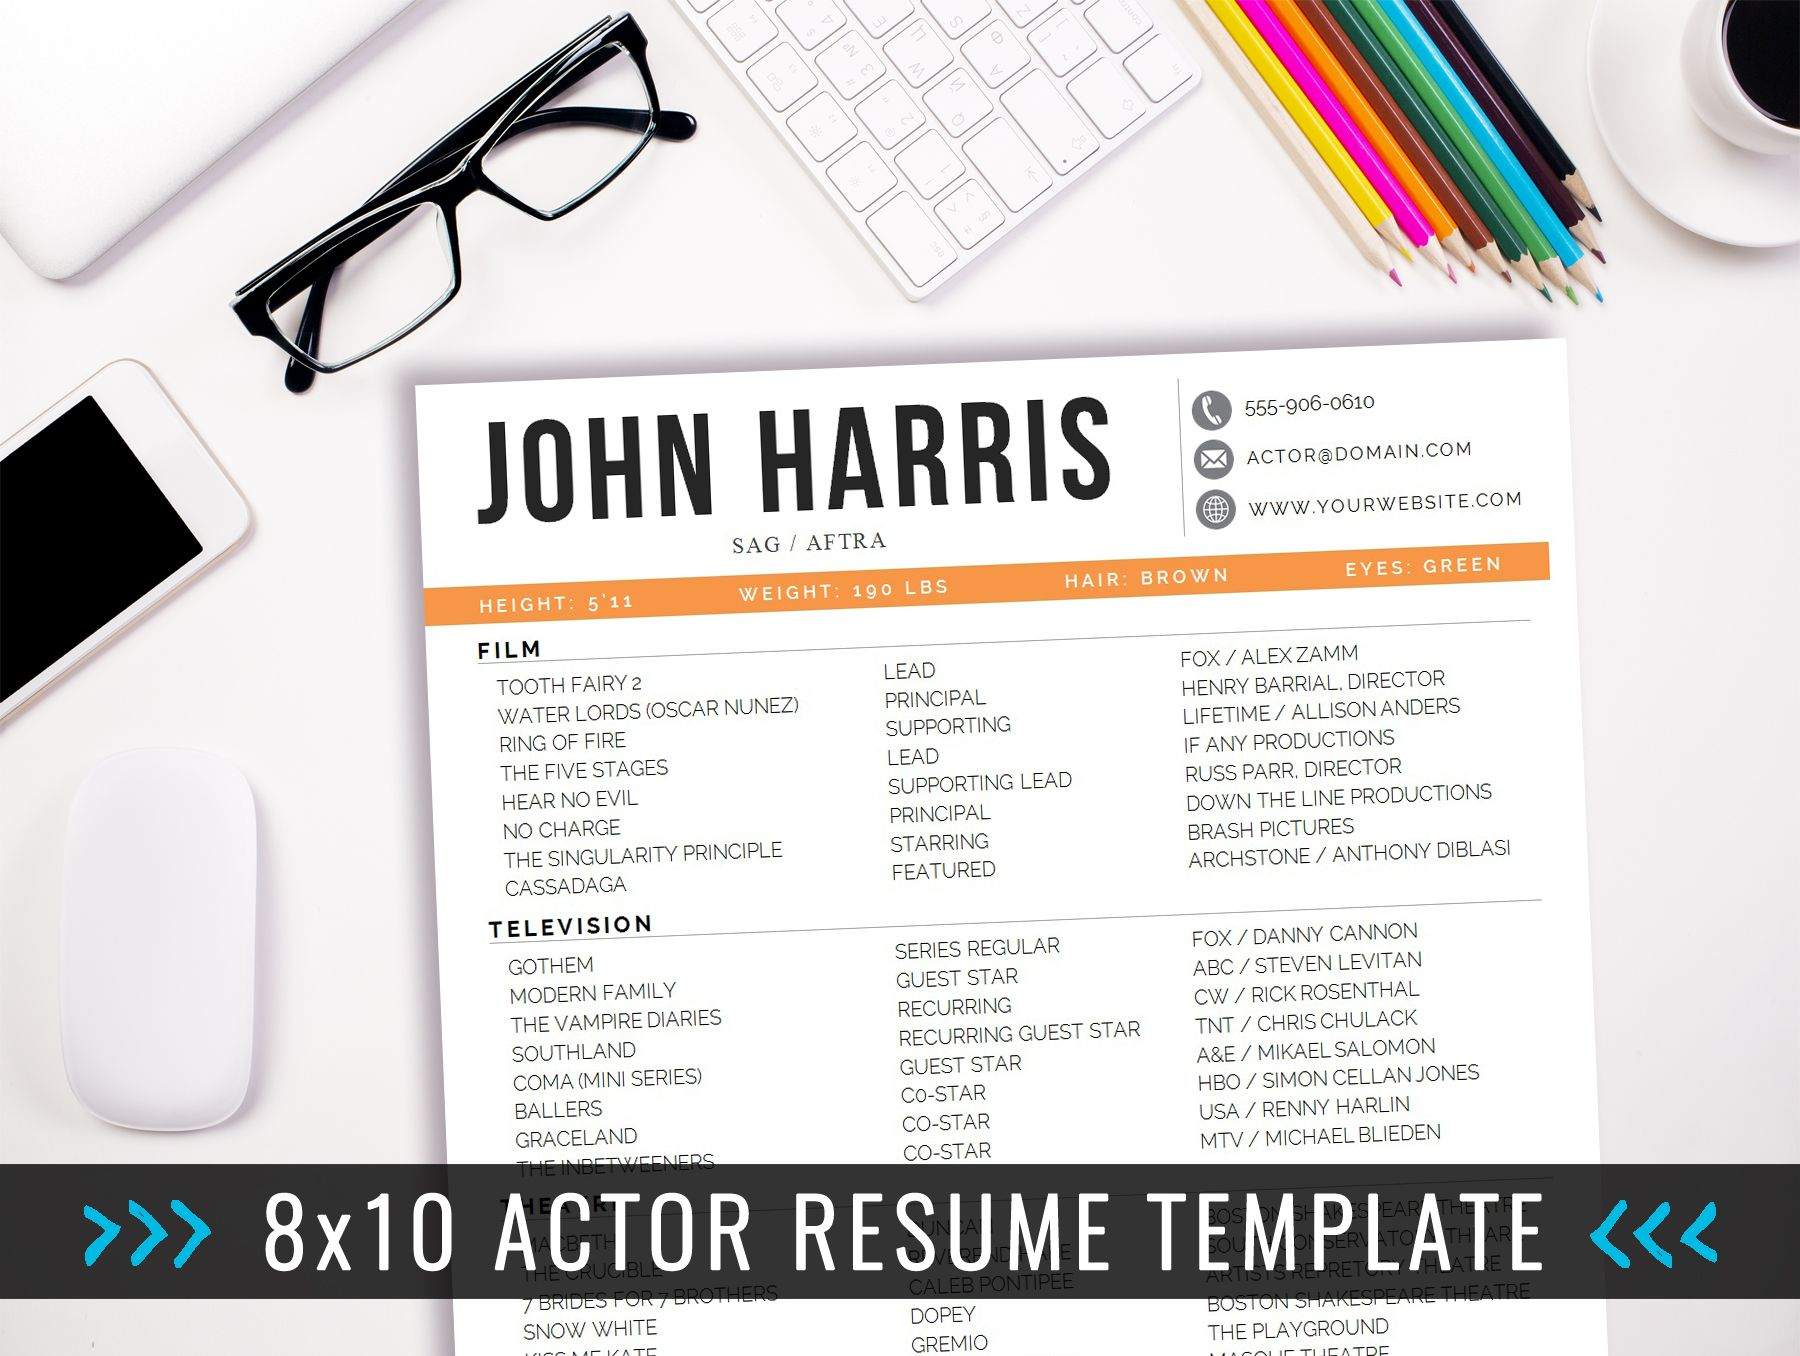 Buy resume 8x10